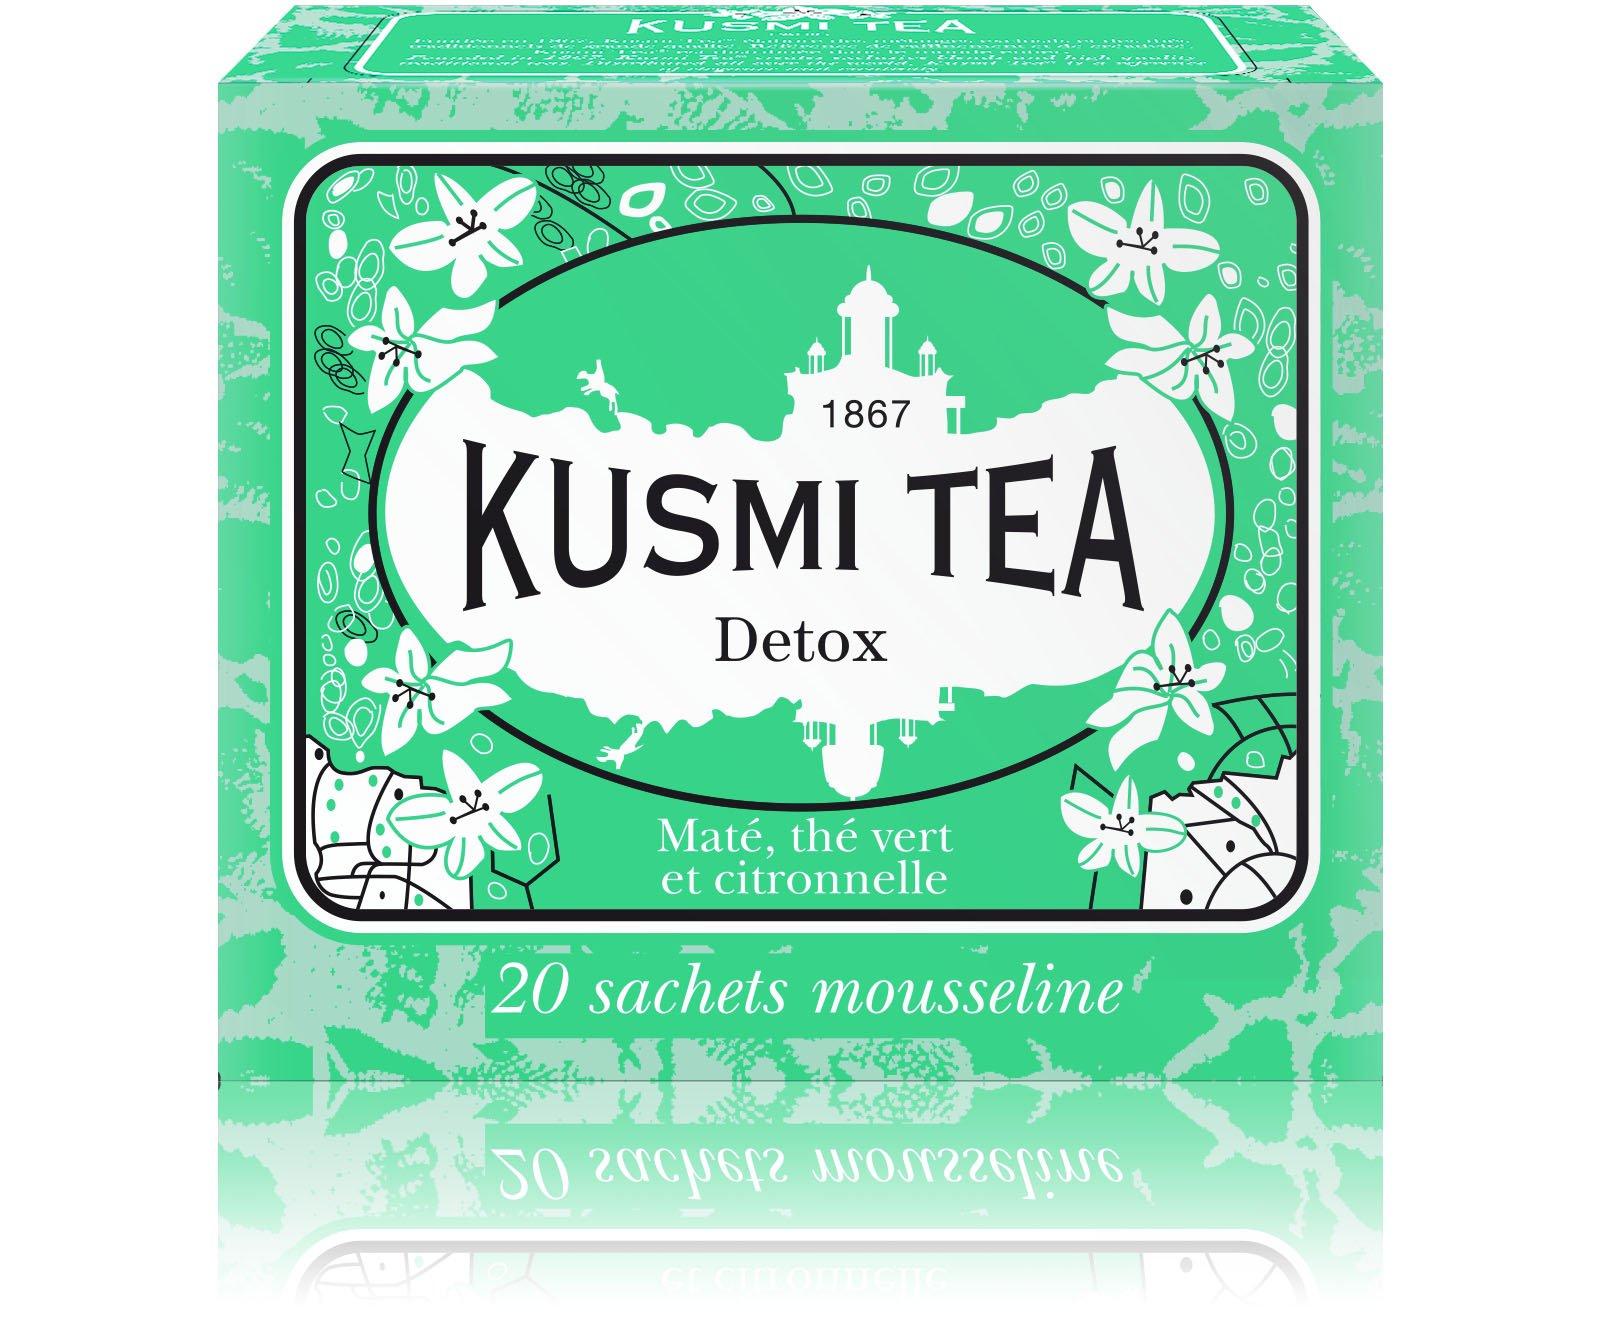 Kusmi Tea - Detox - Natural Green Tea with Lemongrass, Scent of Lemon and Blend of Yerba Mate (20 Muslin Tea Bags)